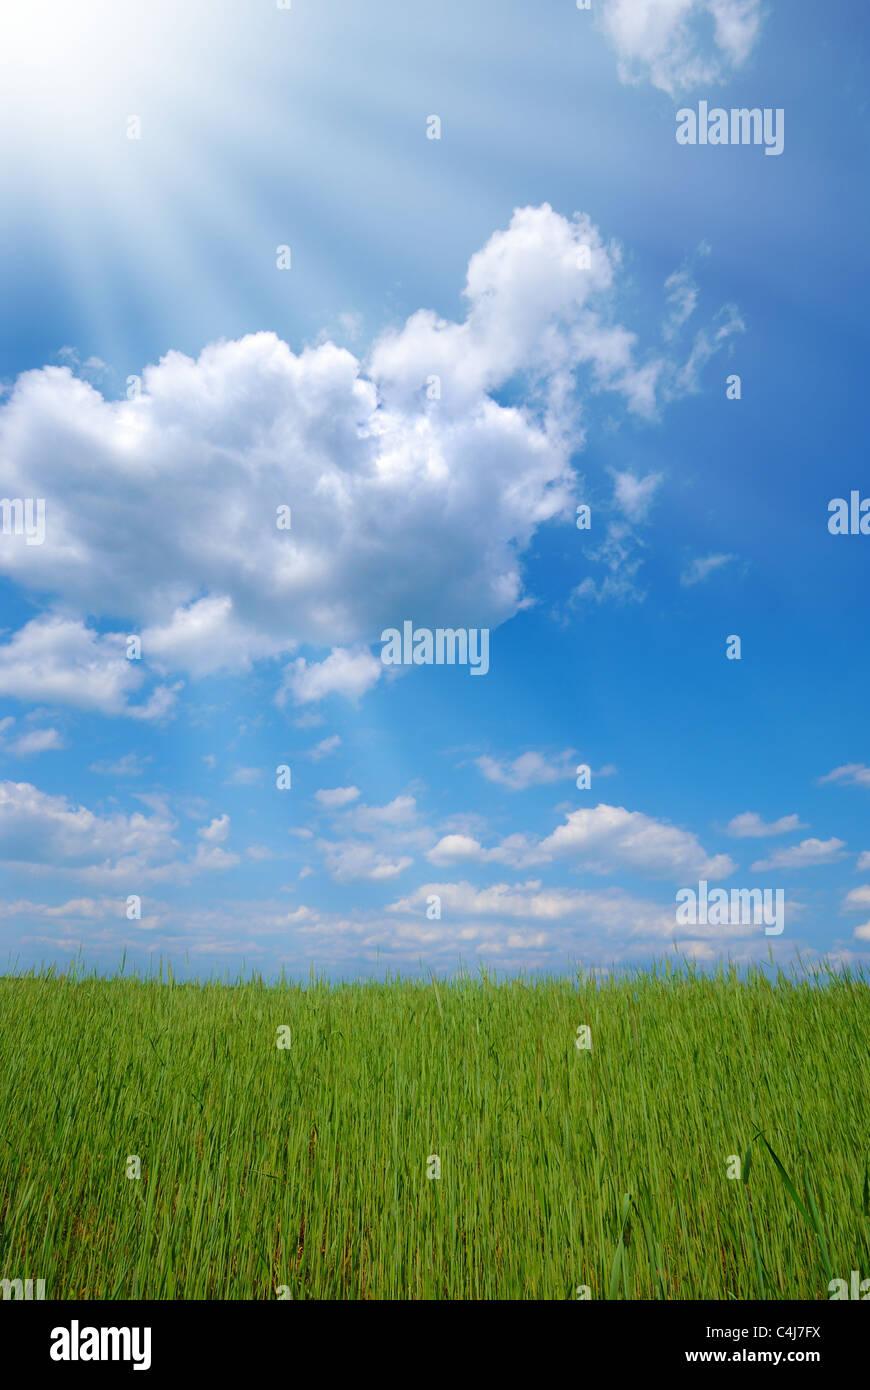 Green wheat field under cloudy sunny blue sky Stock Photo